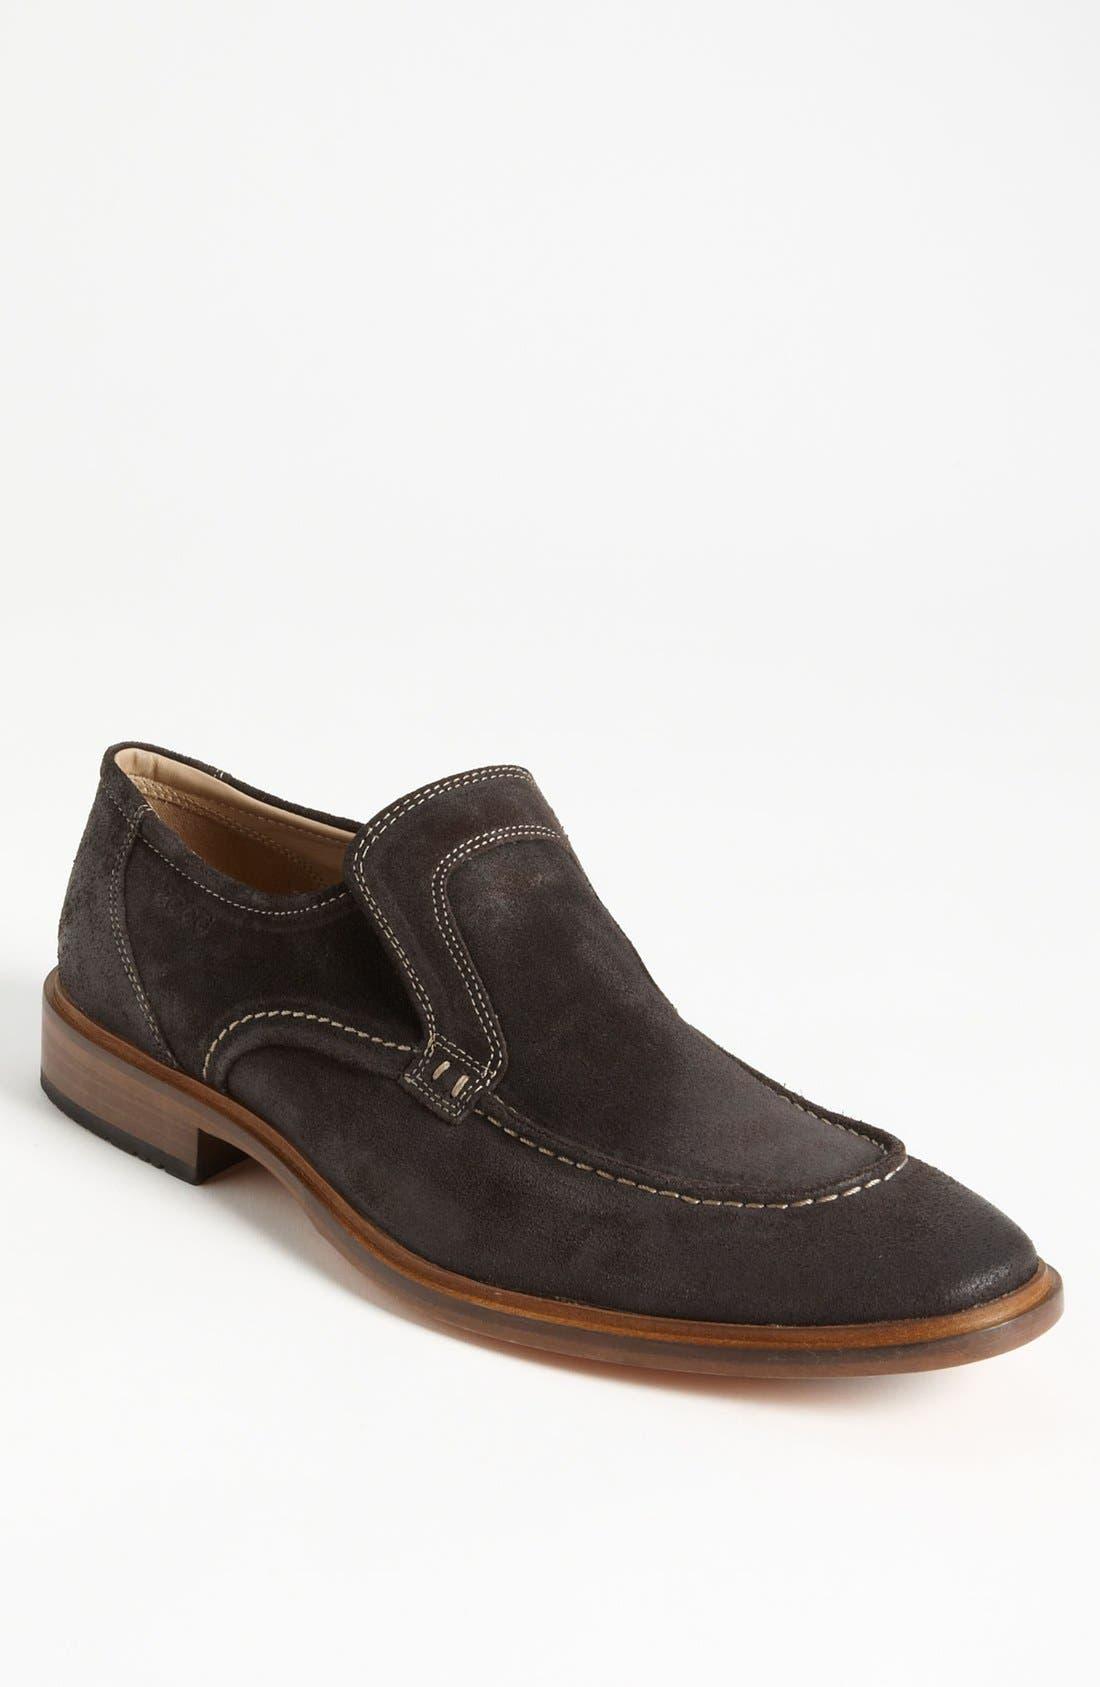 Main Image - ECCO 'Pedoso' Venetian Loafer (Men)